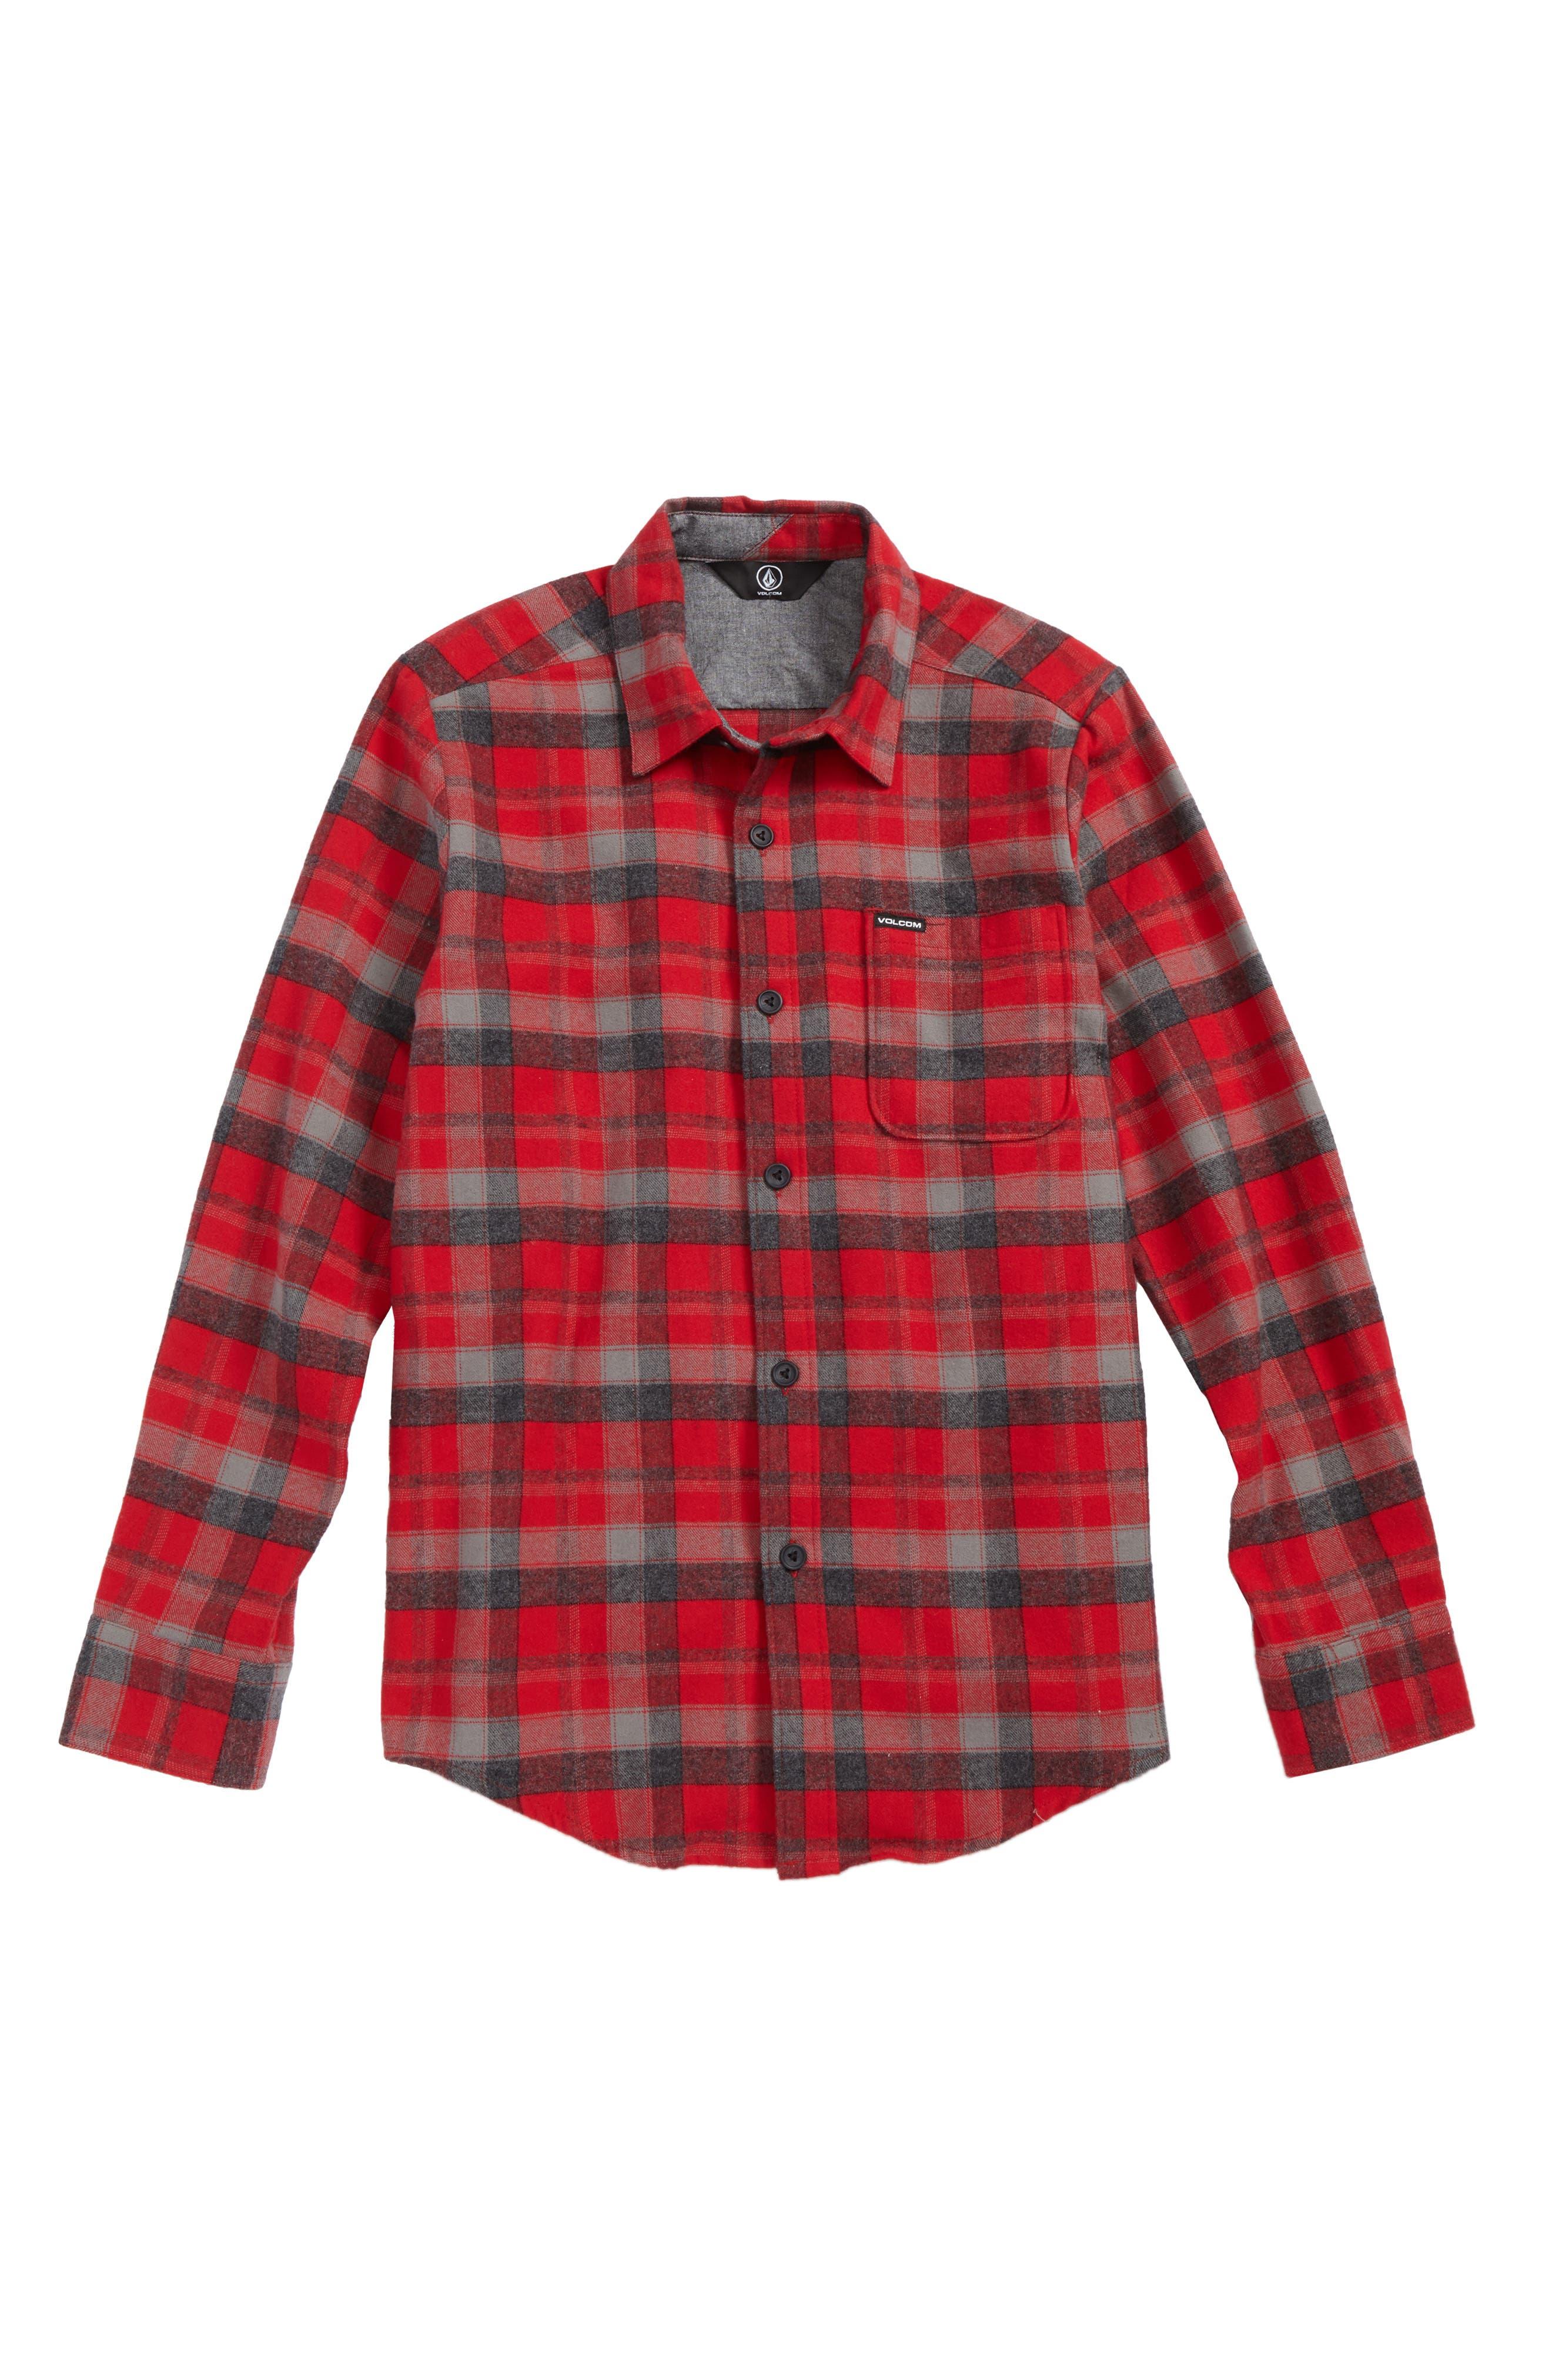 Volcom Caden Plaid Flannel Shirt (Toddler Boys, Little Boys & Big Boys)